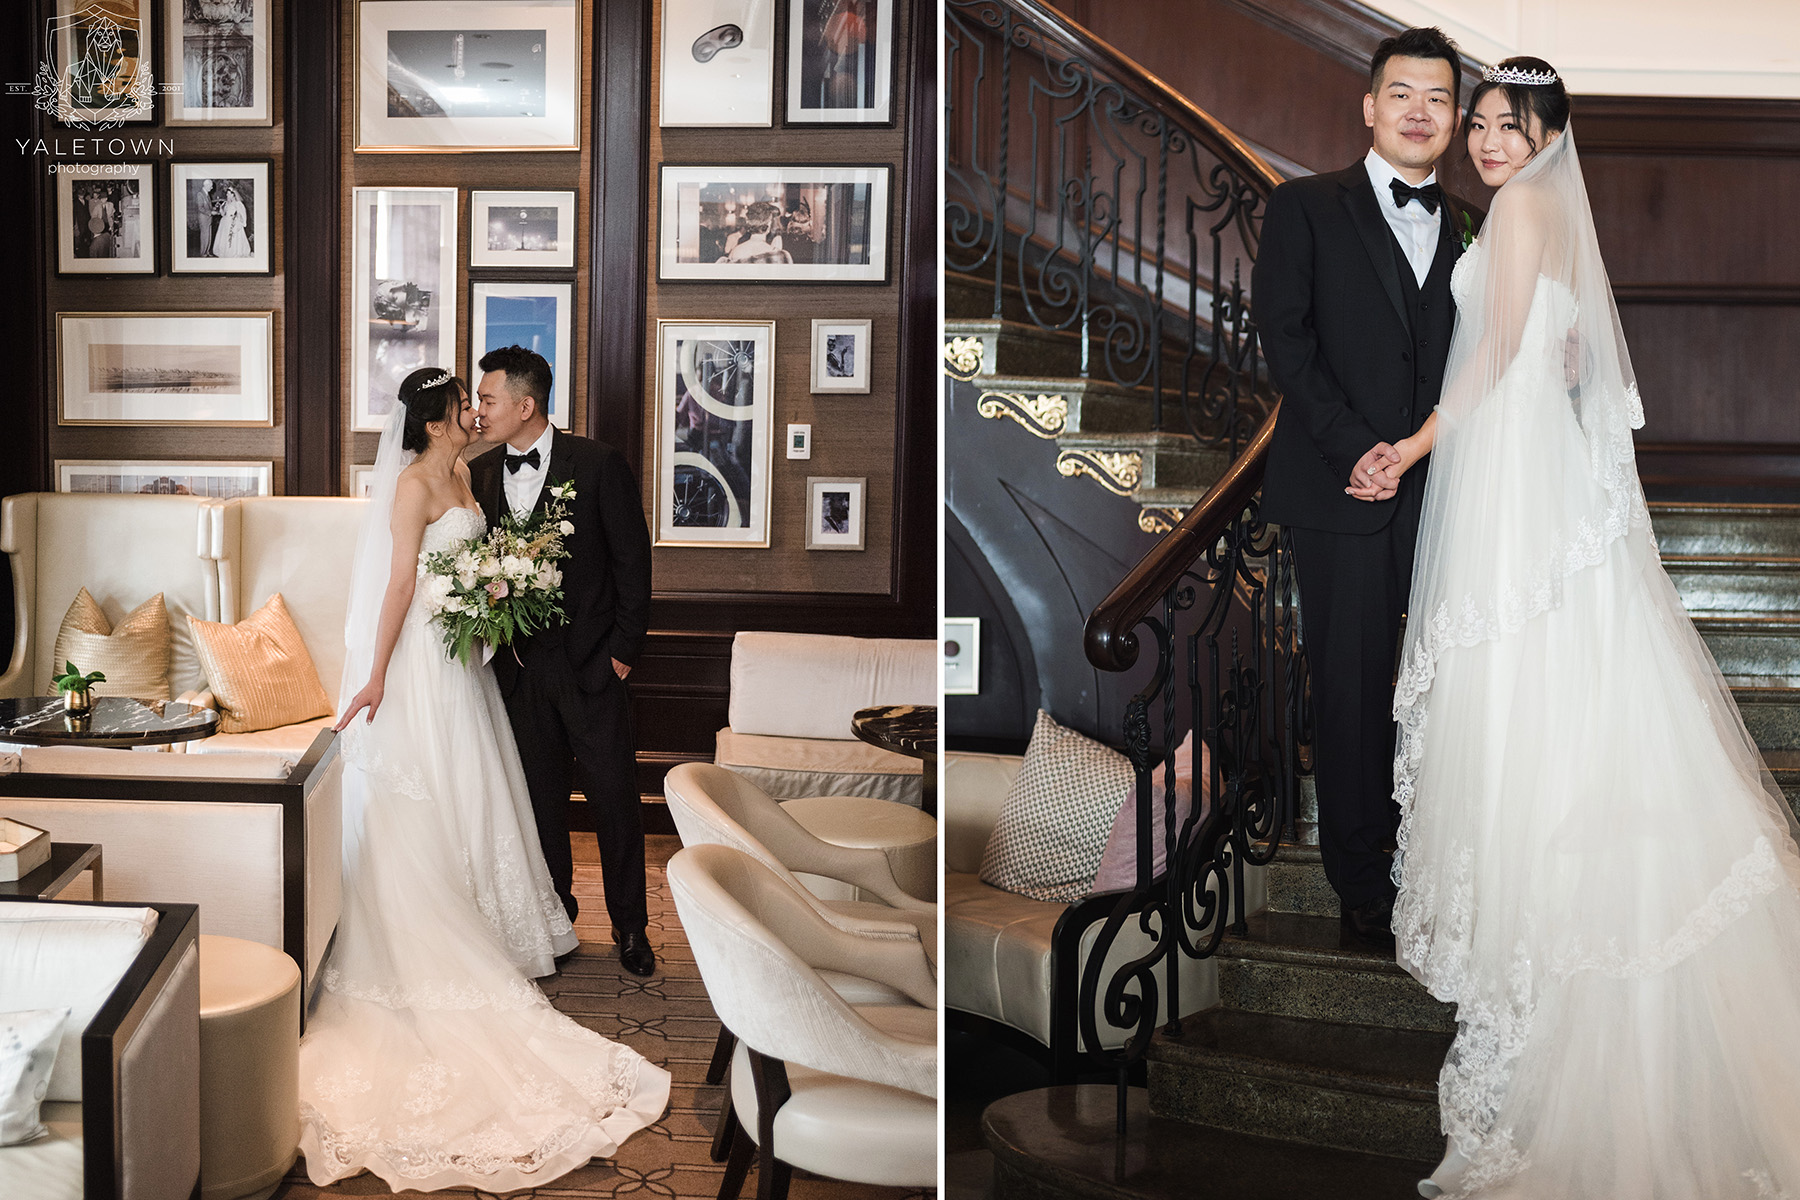 Bride-Groom-Portraits-Rosewood-Hotel-Georgia-Vancouver-Wedding-Yaletown-Photography-photo